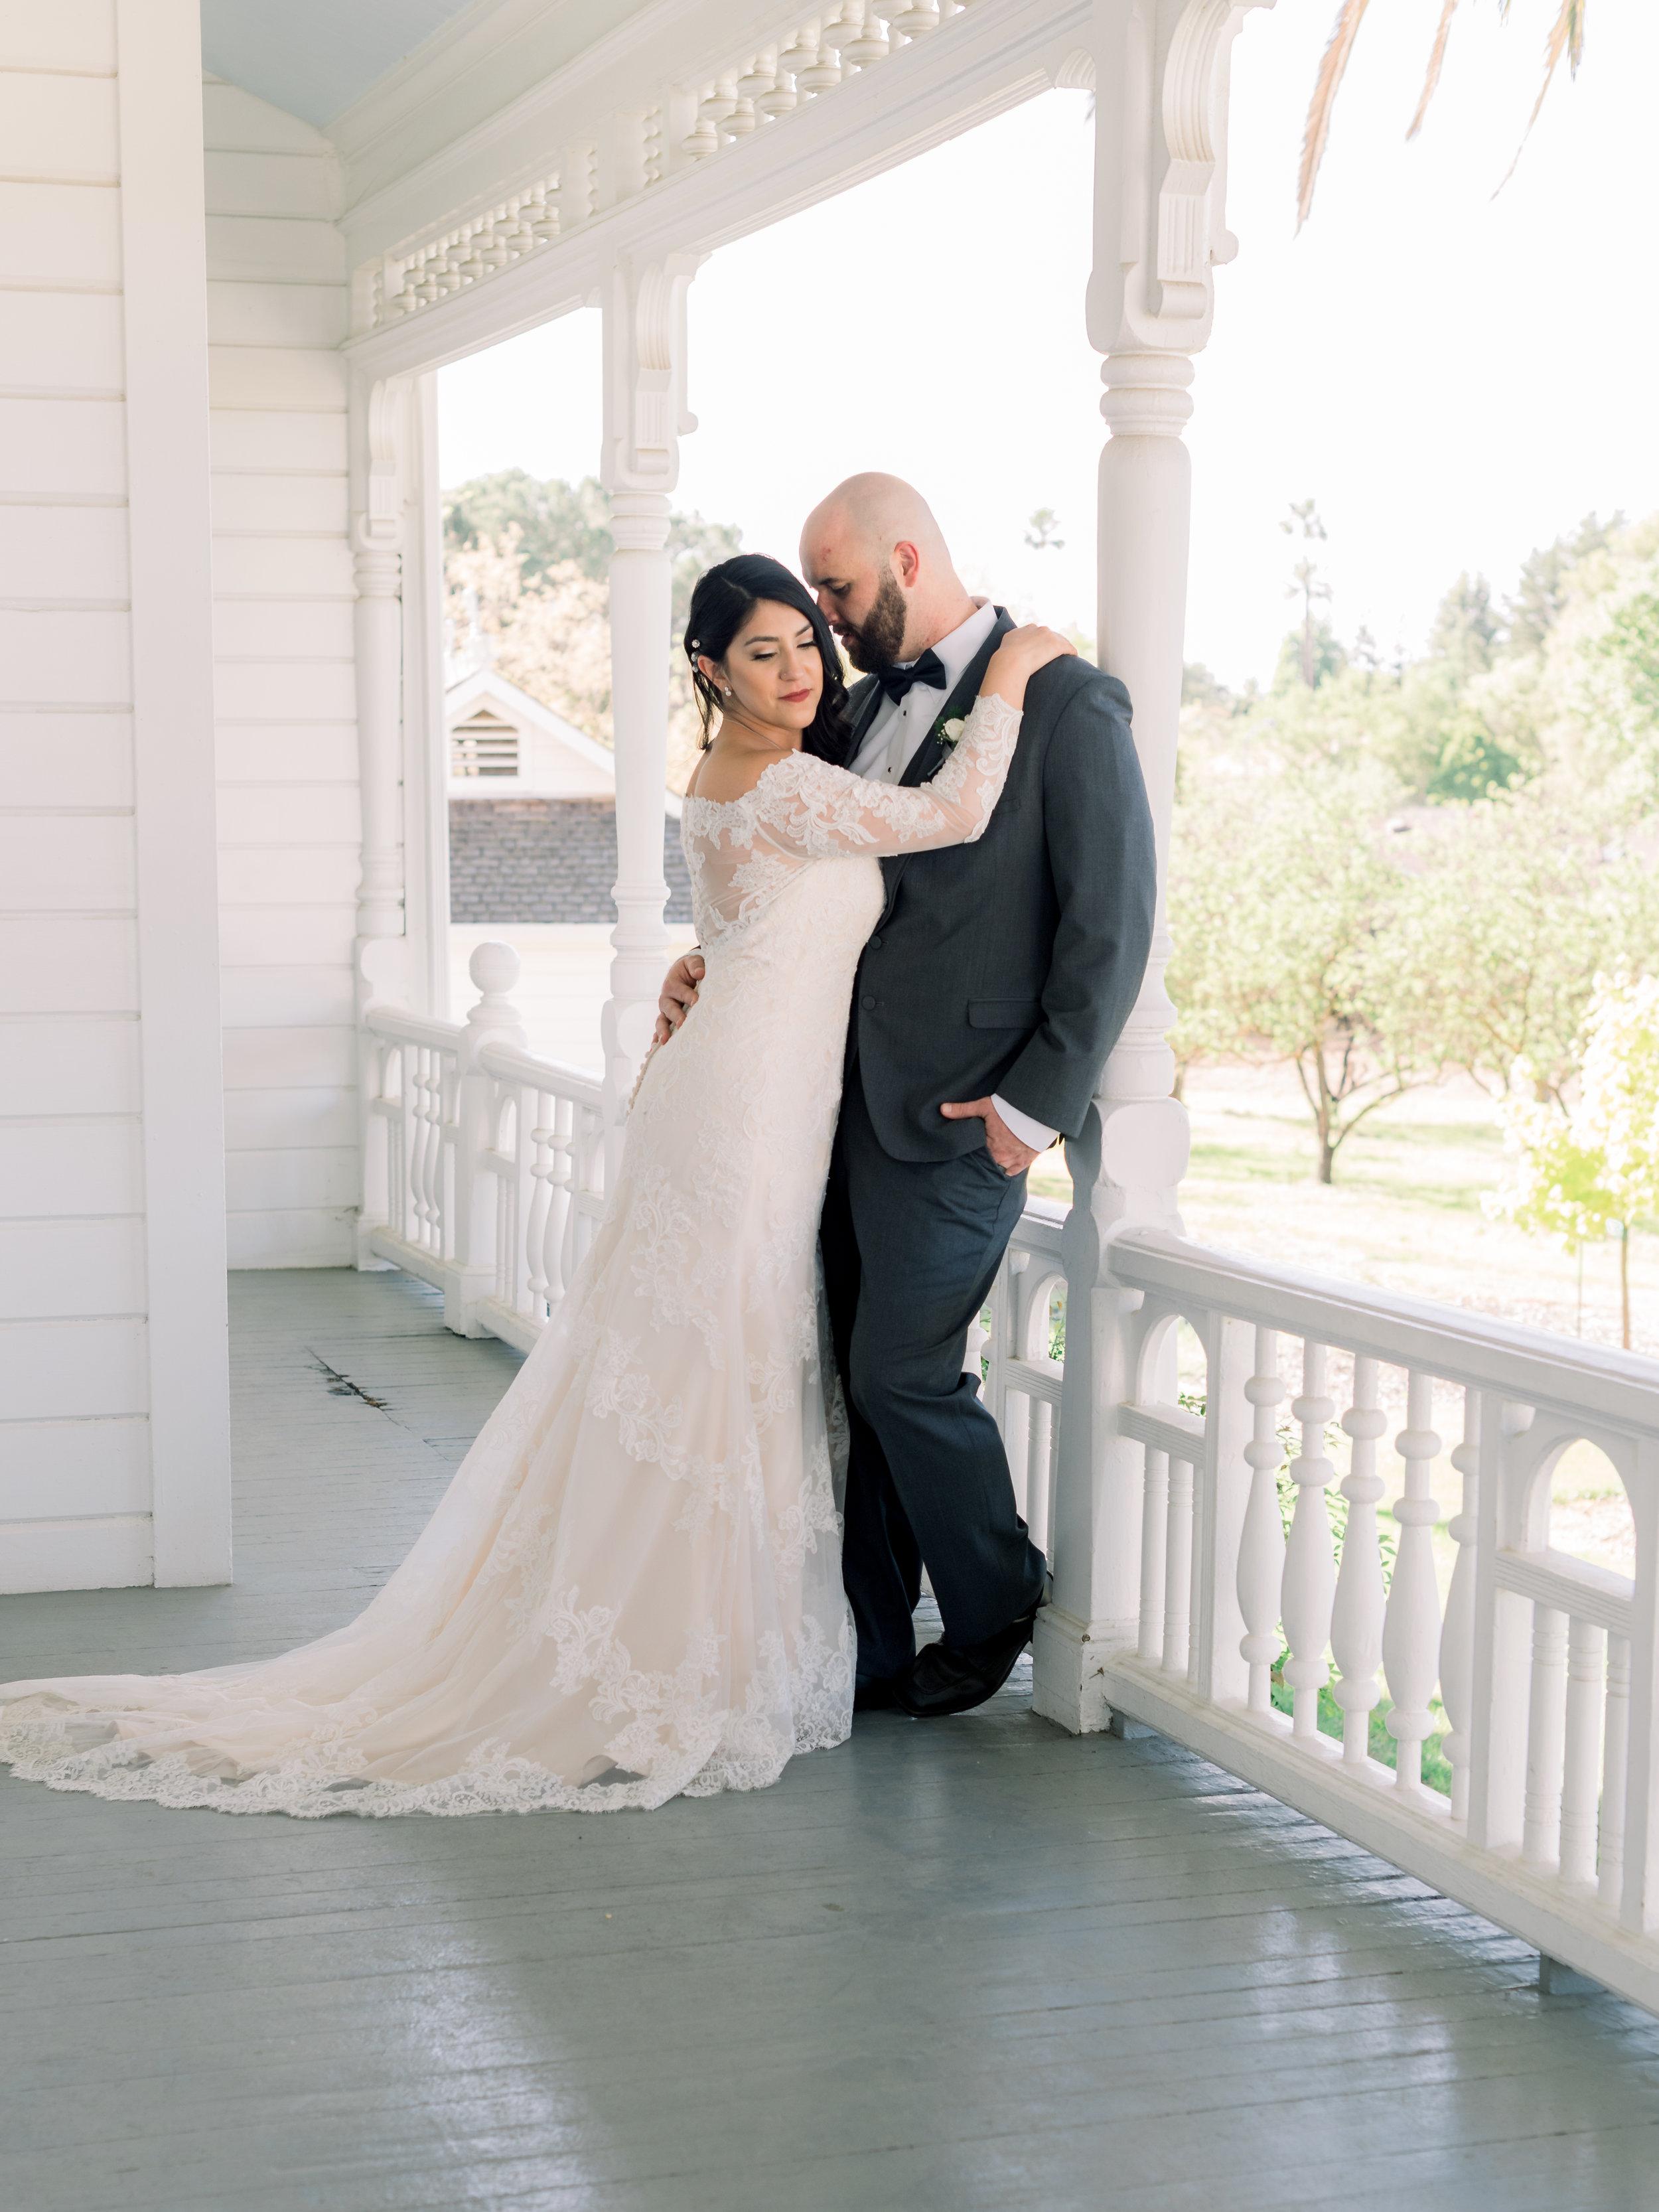 wedding-portrait-of-the-groom-holding-the-bride.jpg